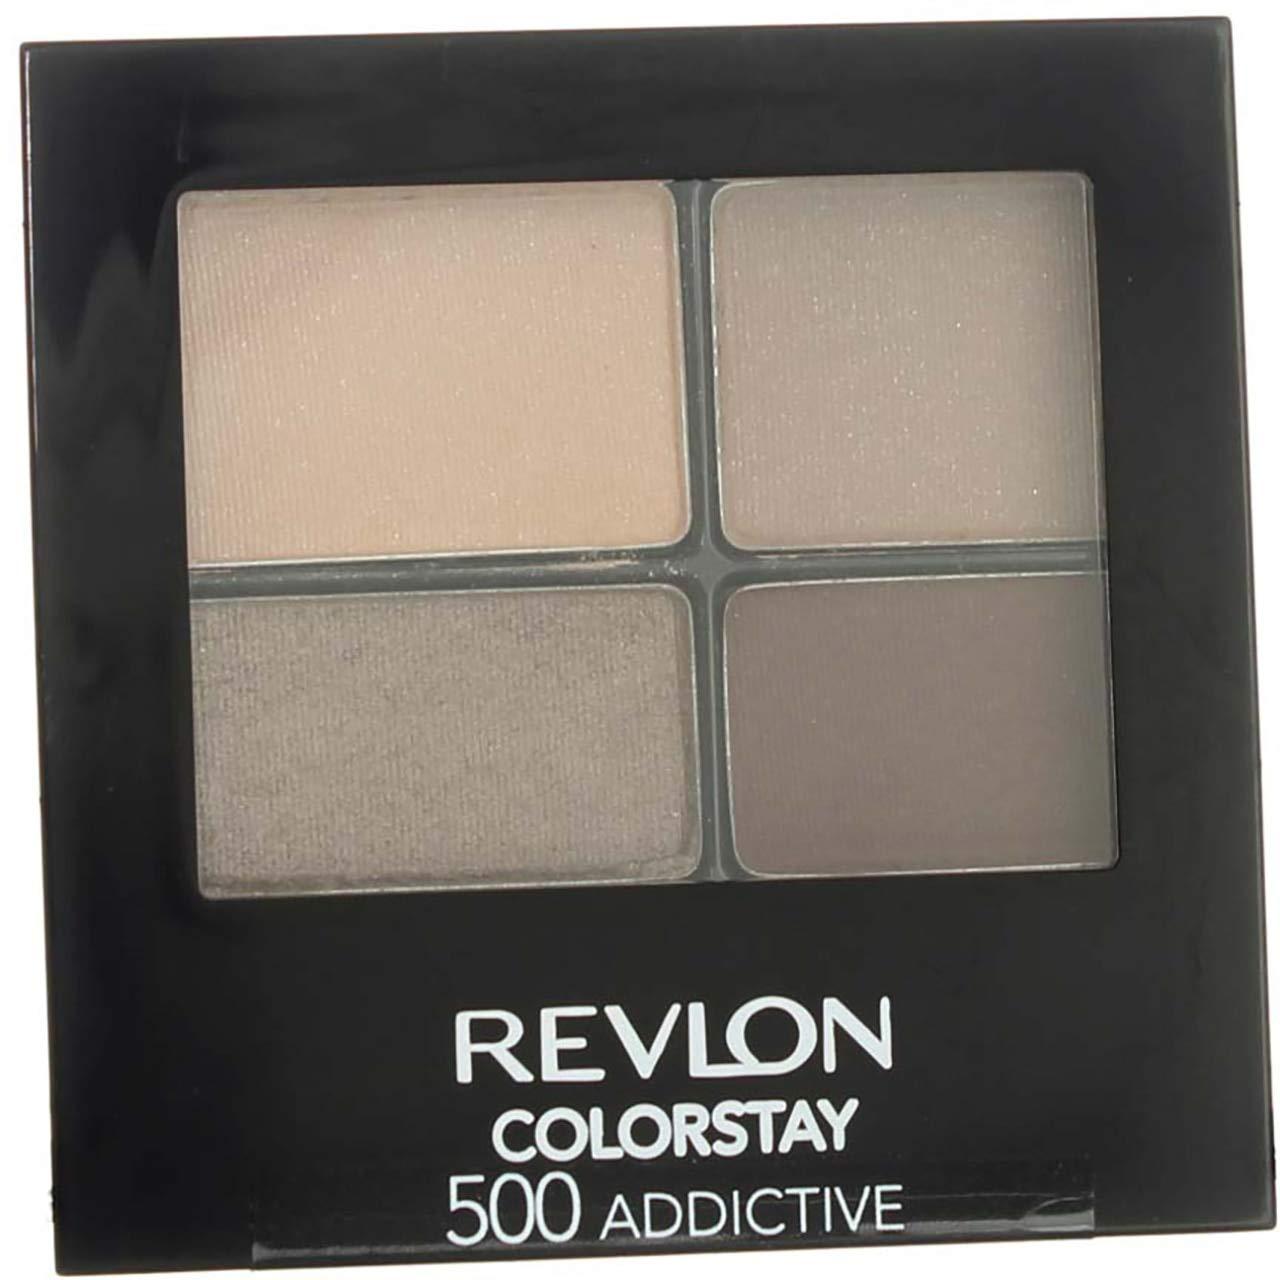 Revlon ColorStay 16 Hour Eye Shadow, Addictive [500] 0.16 oz (Pack of 4)